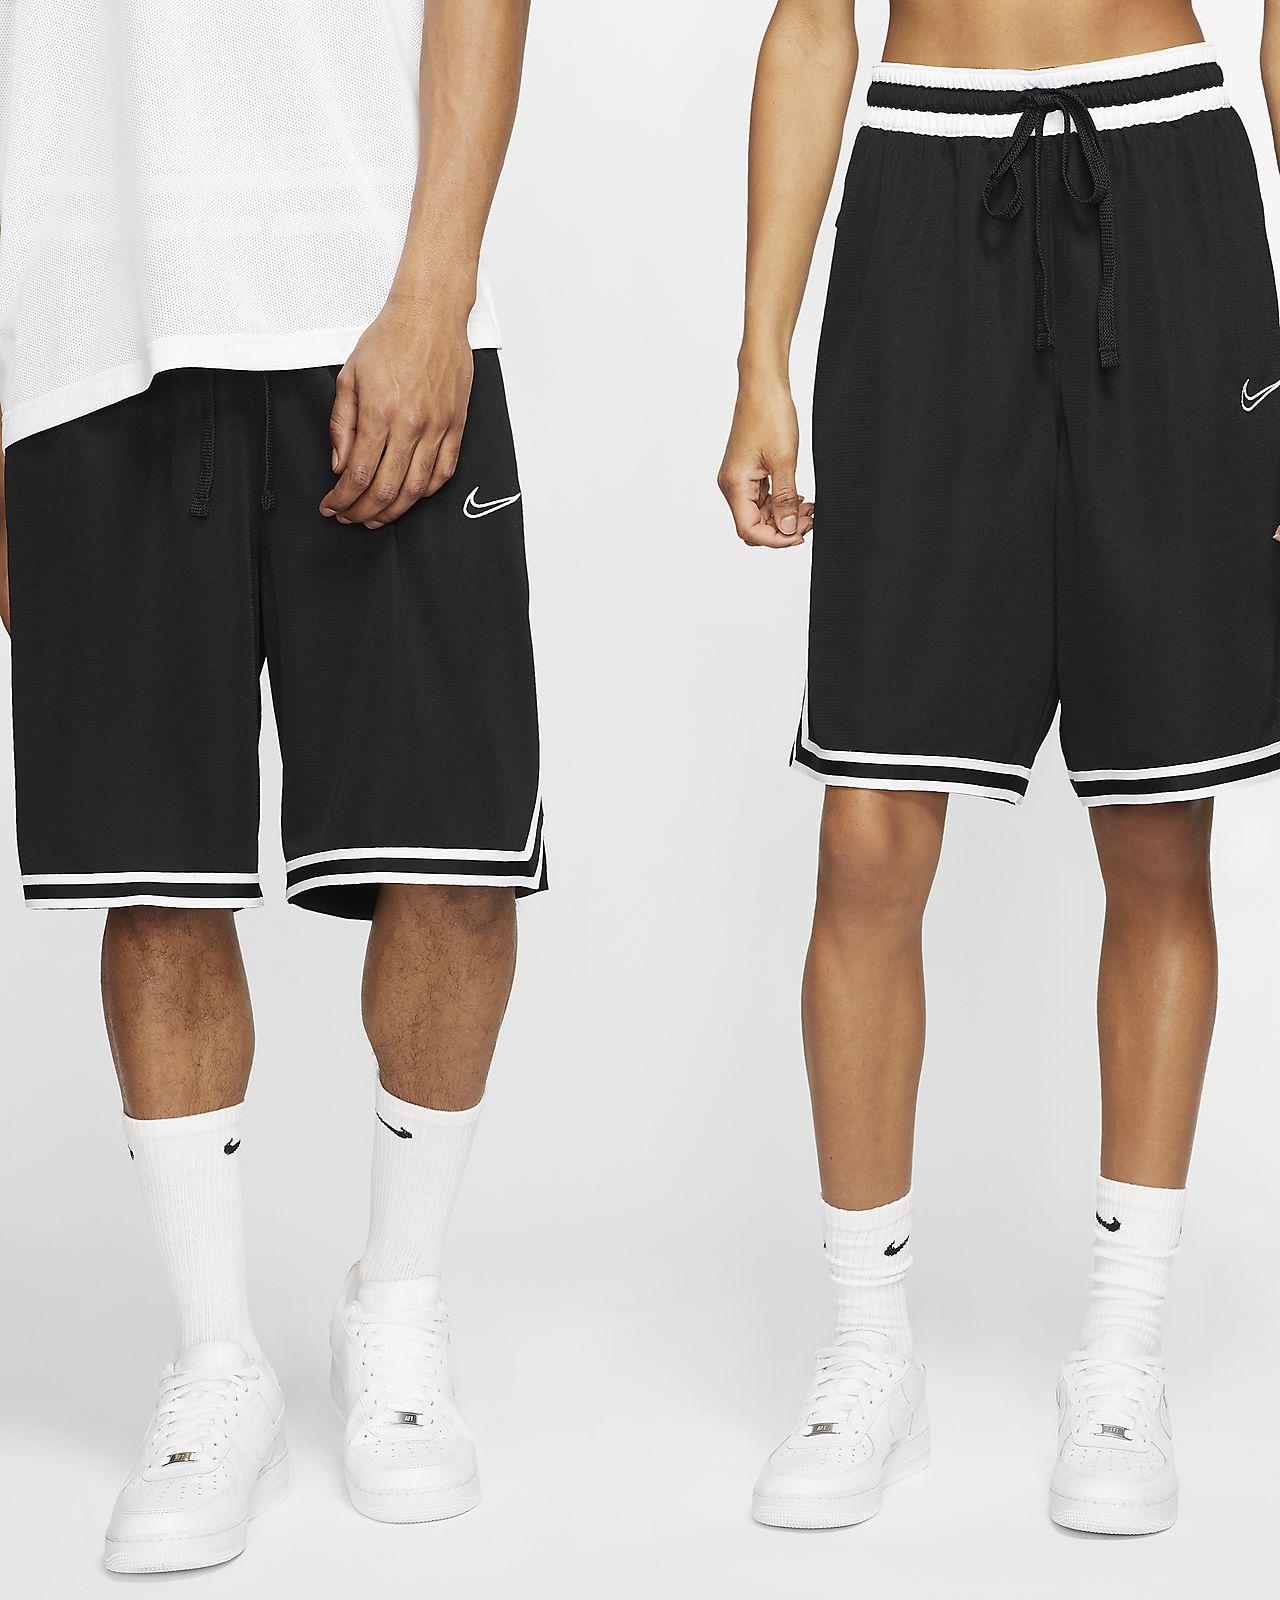 Nike gewebte Trainingsshorts (ca. 15 cm) für ältere Kinder (Jungen)